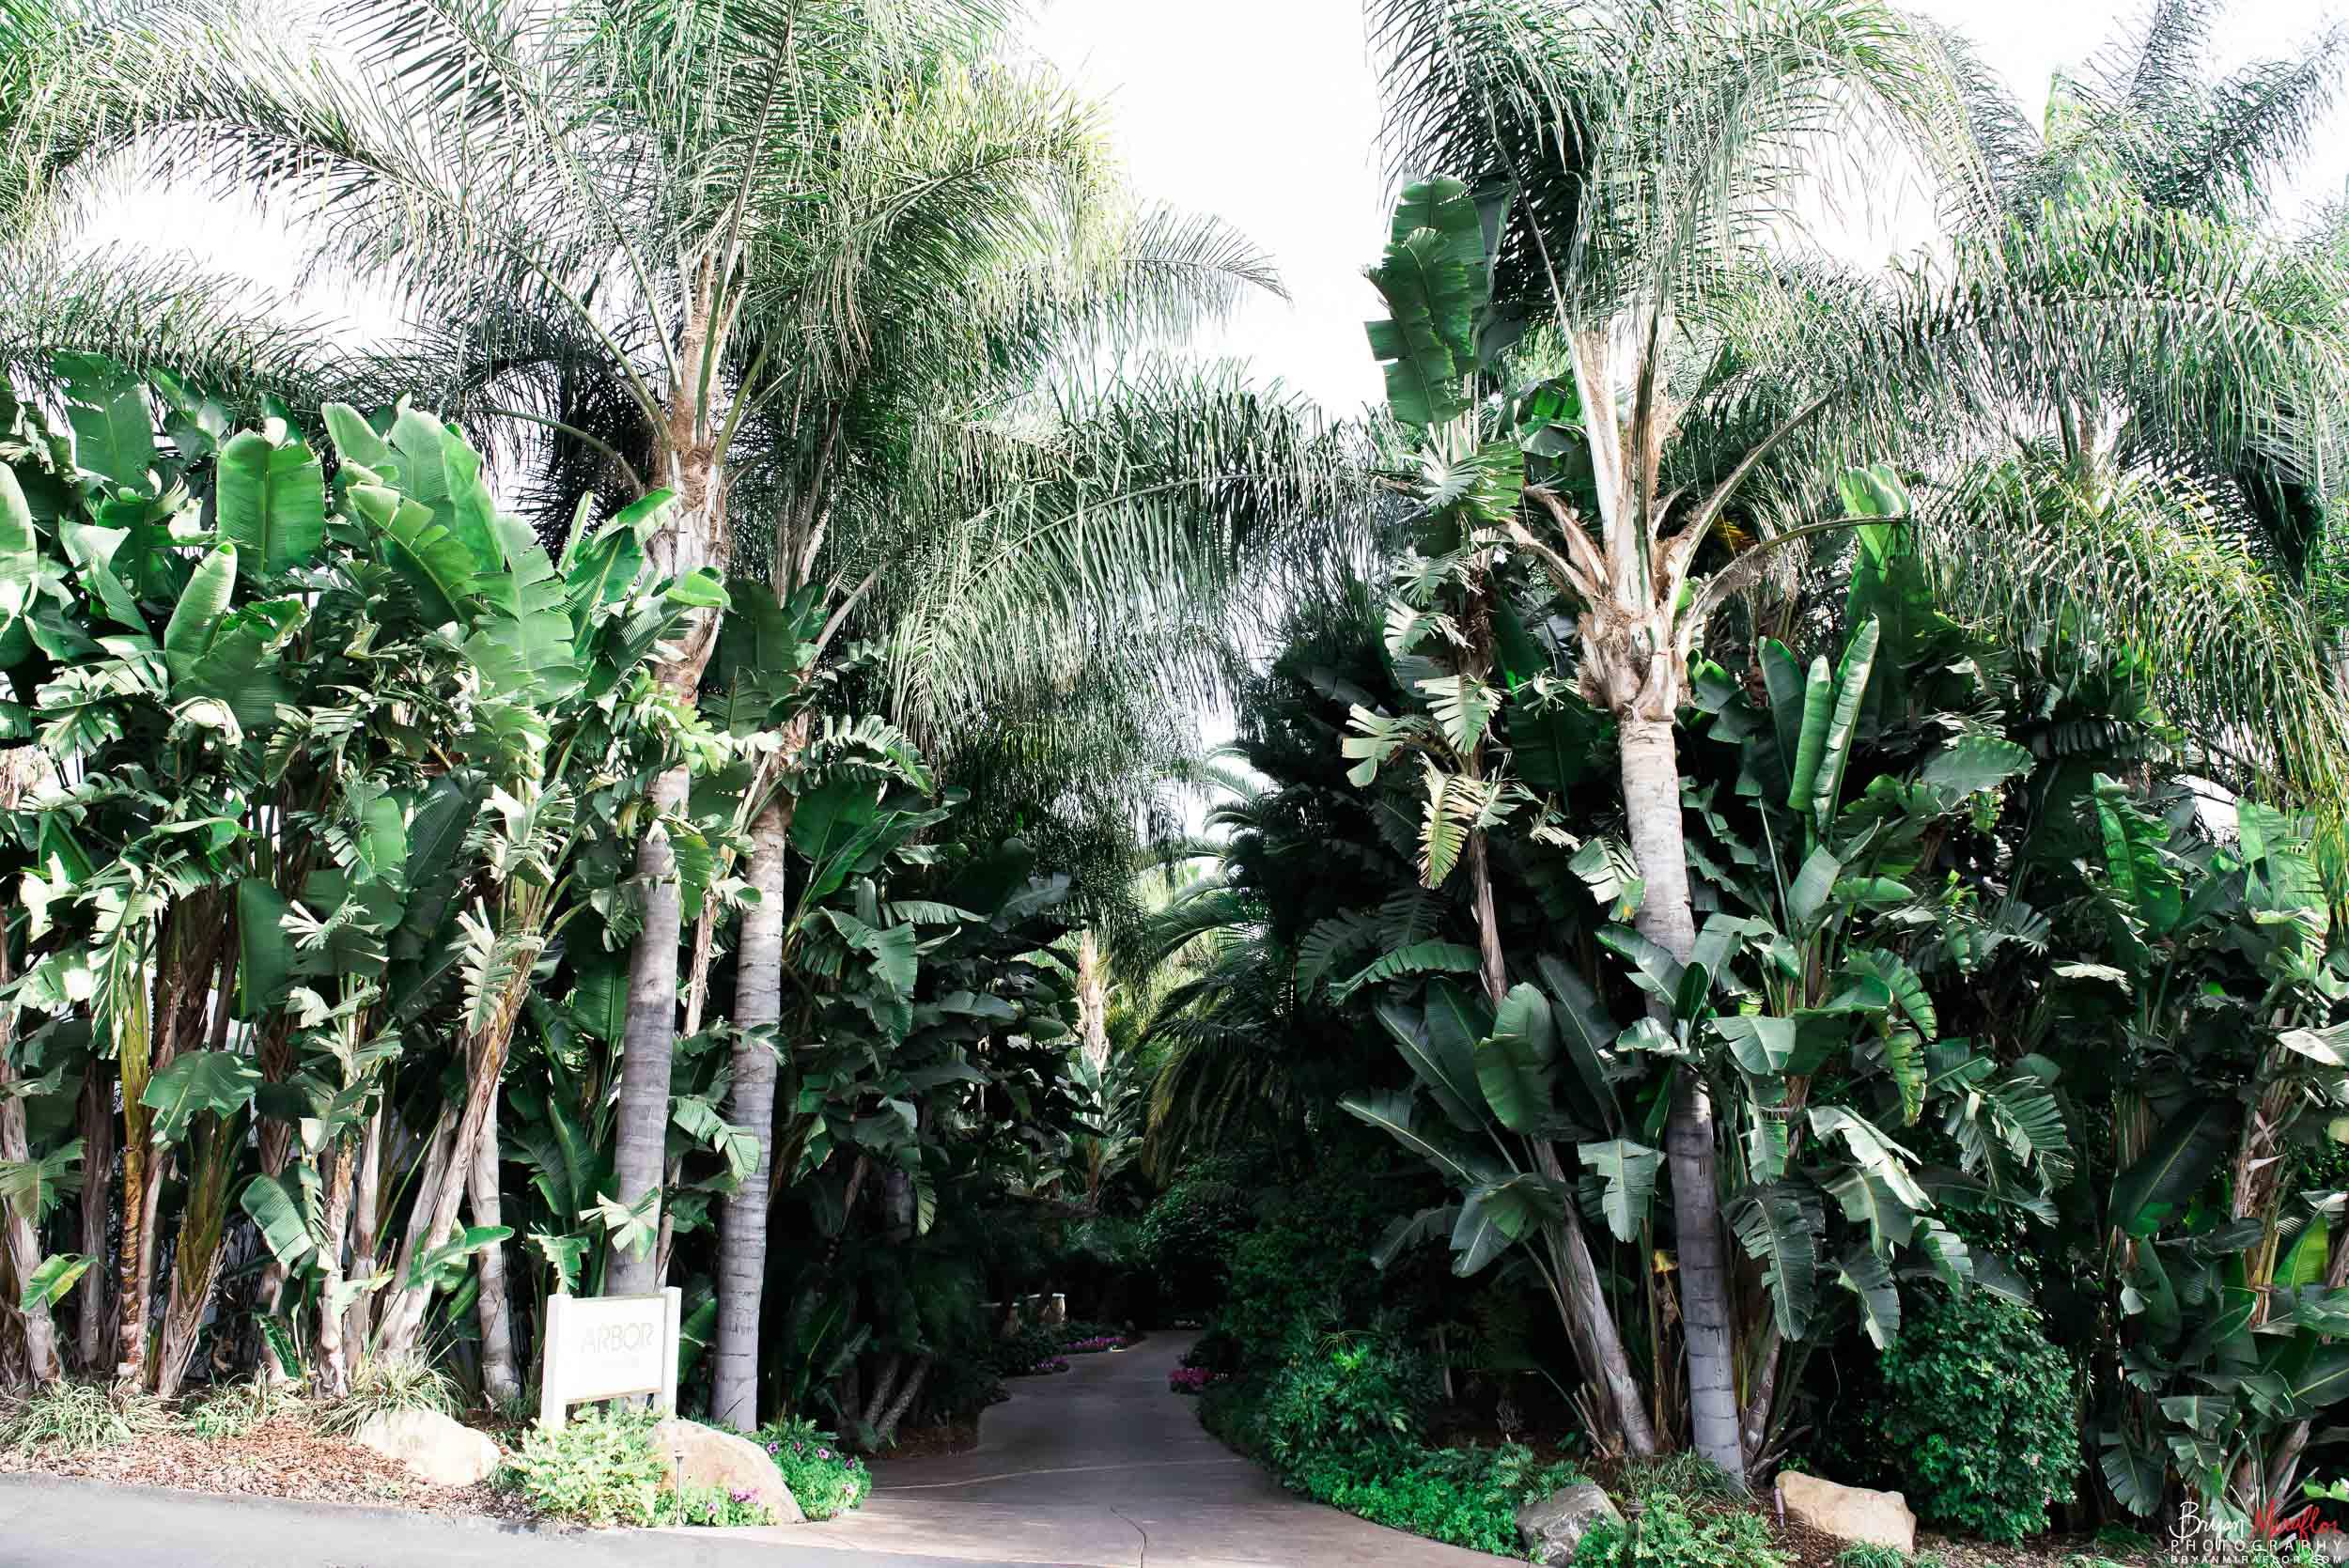 Bryan-Miraflor-Photography-Hannah-Jonathan-Married-Grand-Traditions-Estate-Gardens-Fallbrook-20171222-074.jpg